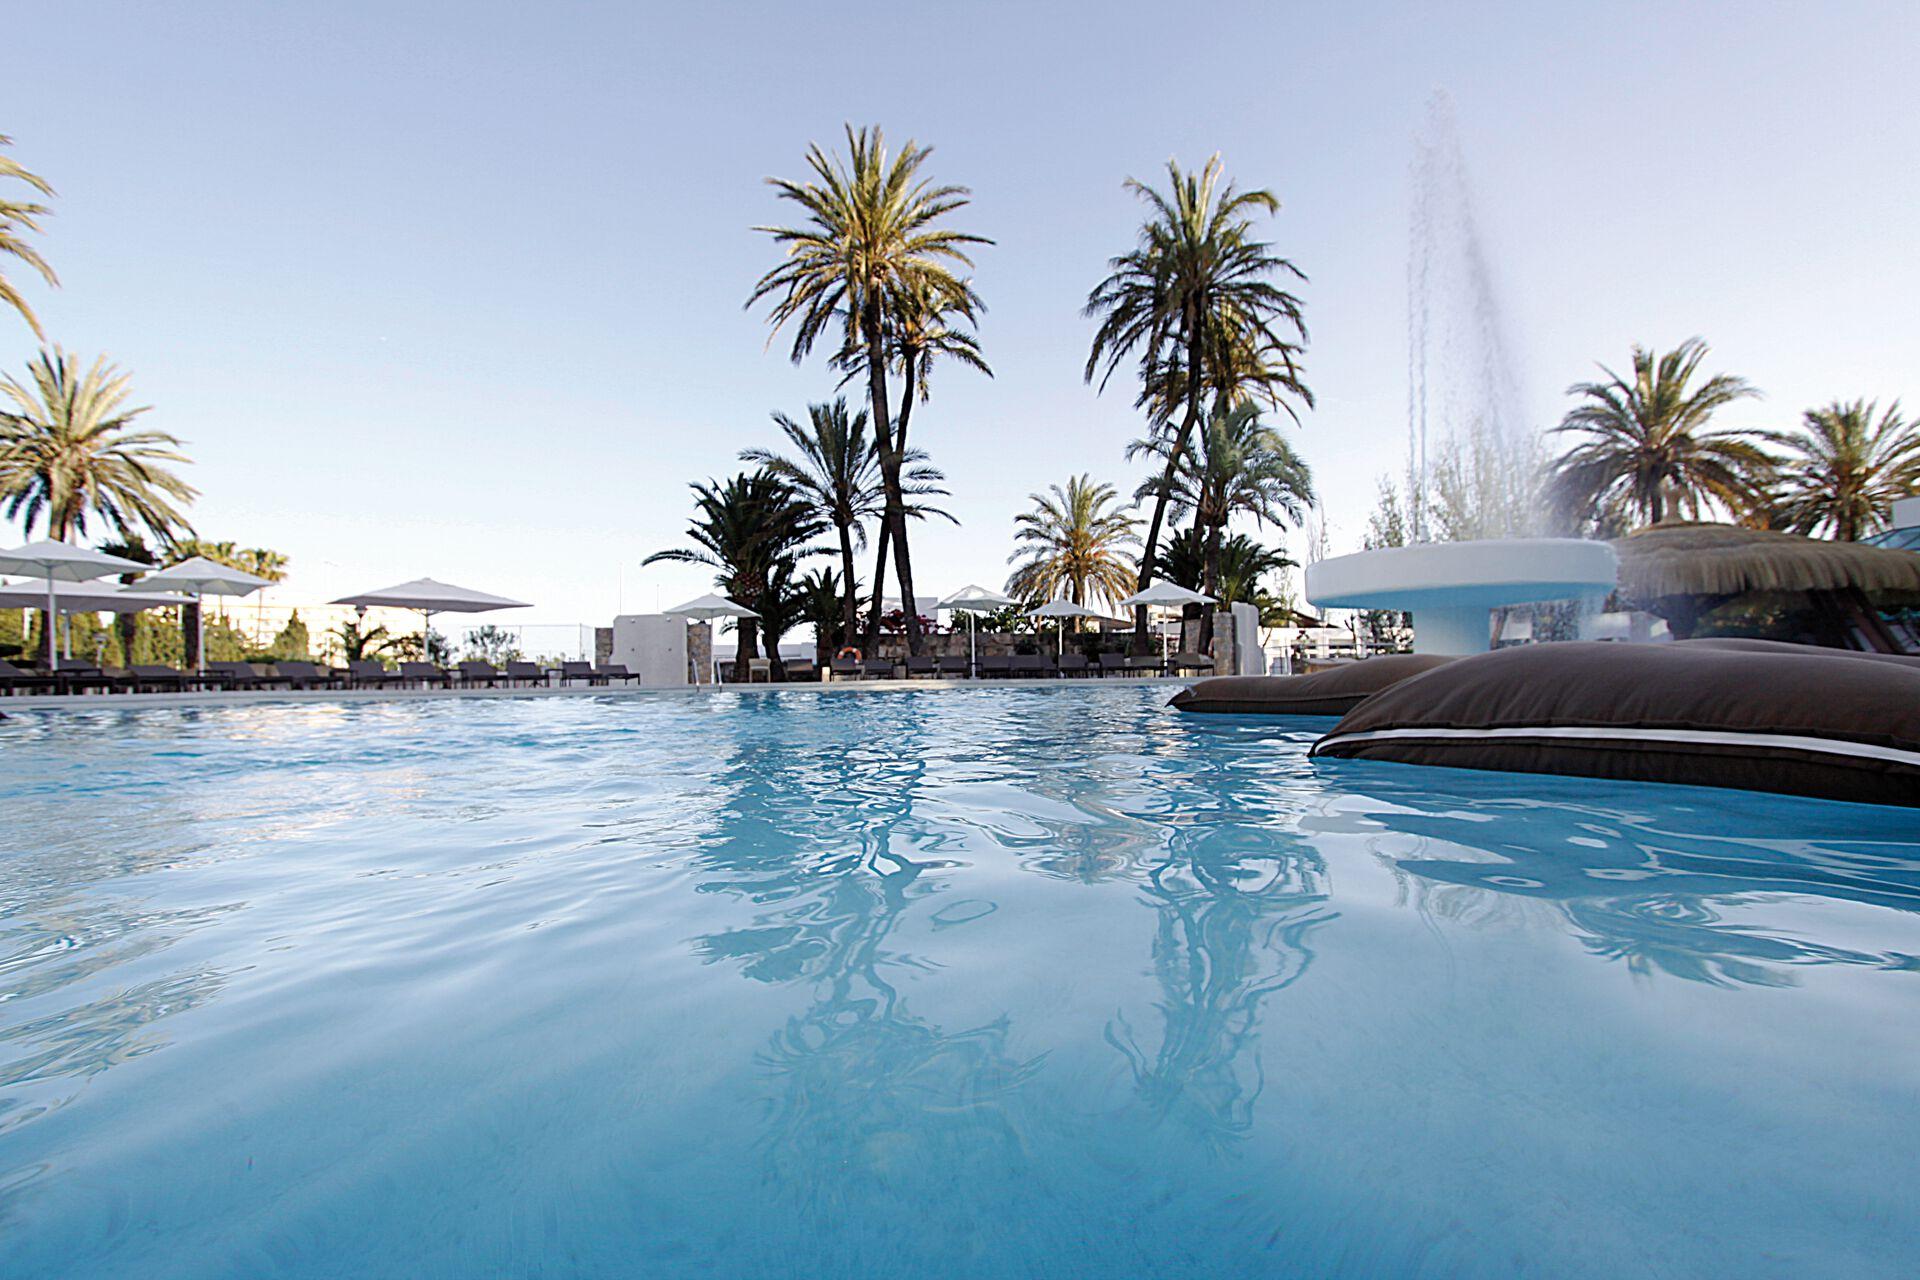 Séjour Palma de Majorque - BG Rei del Mediterrani Palace - 4*